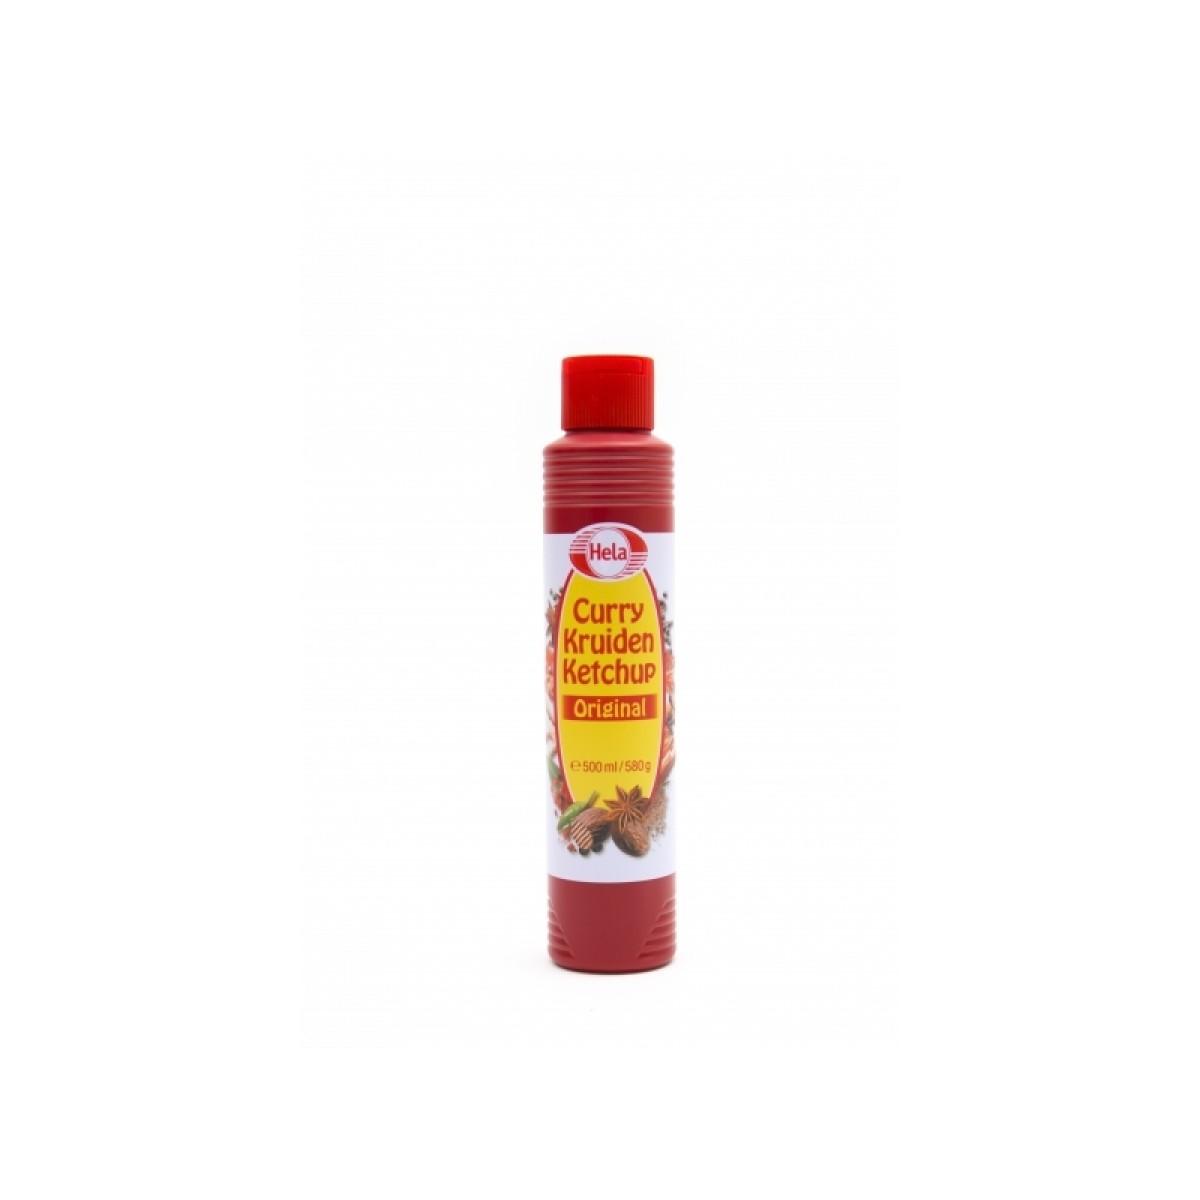 Curry Kruiden Ketchup